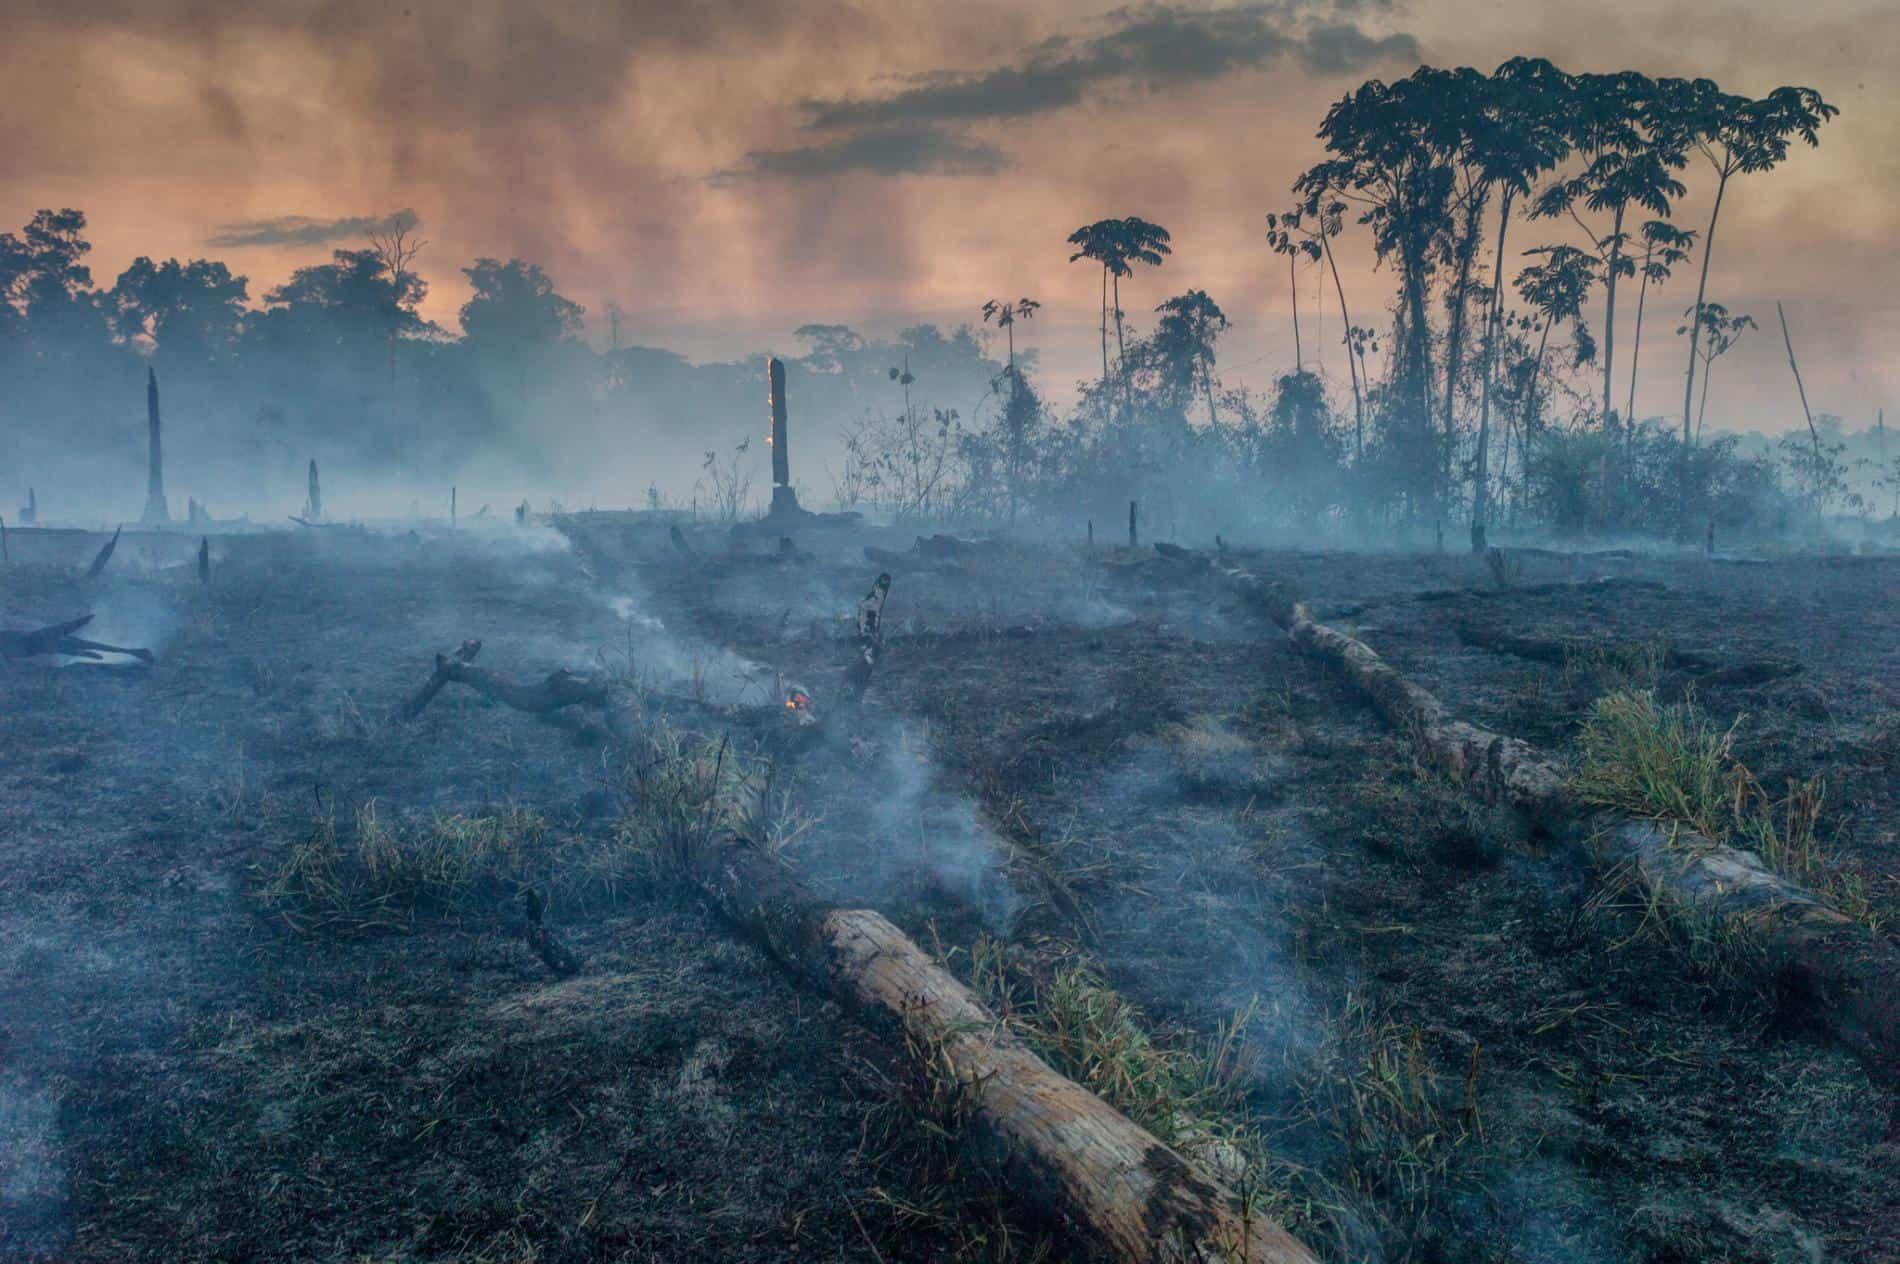 amazon fires slash burn western amazon 13 adapt 1900 1